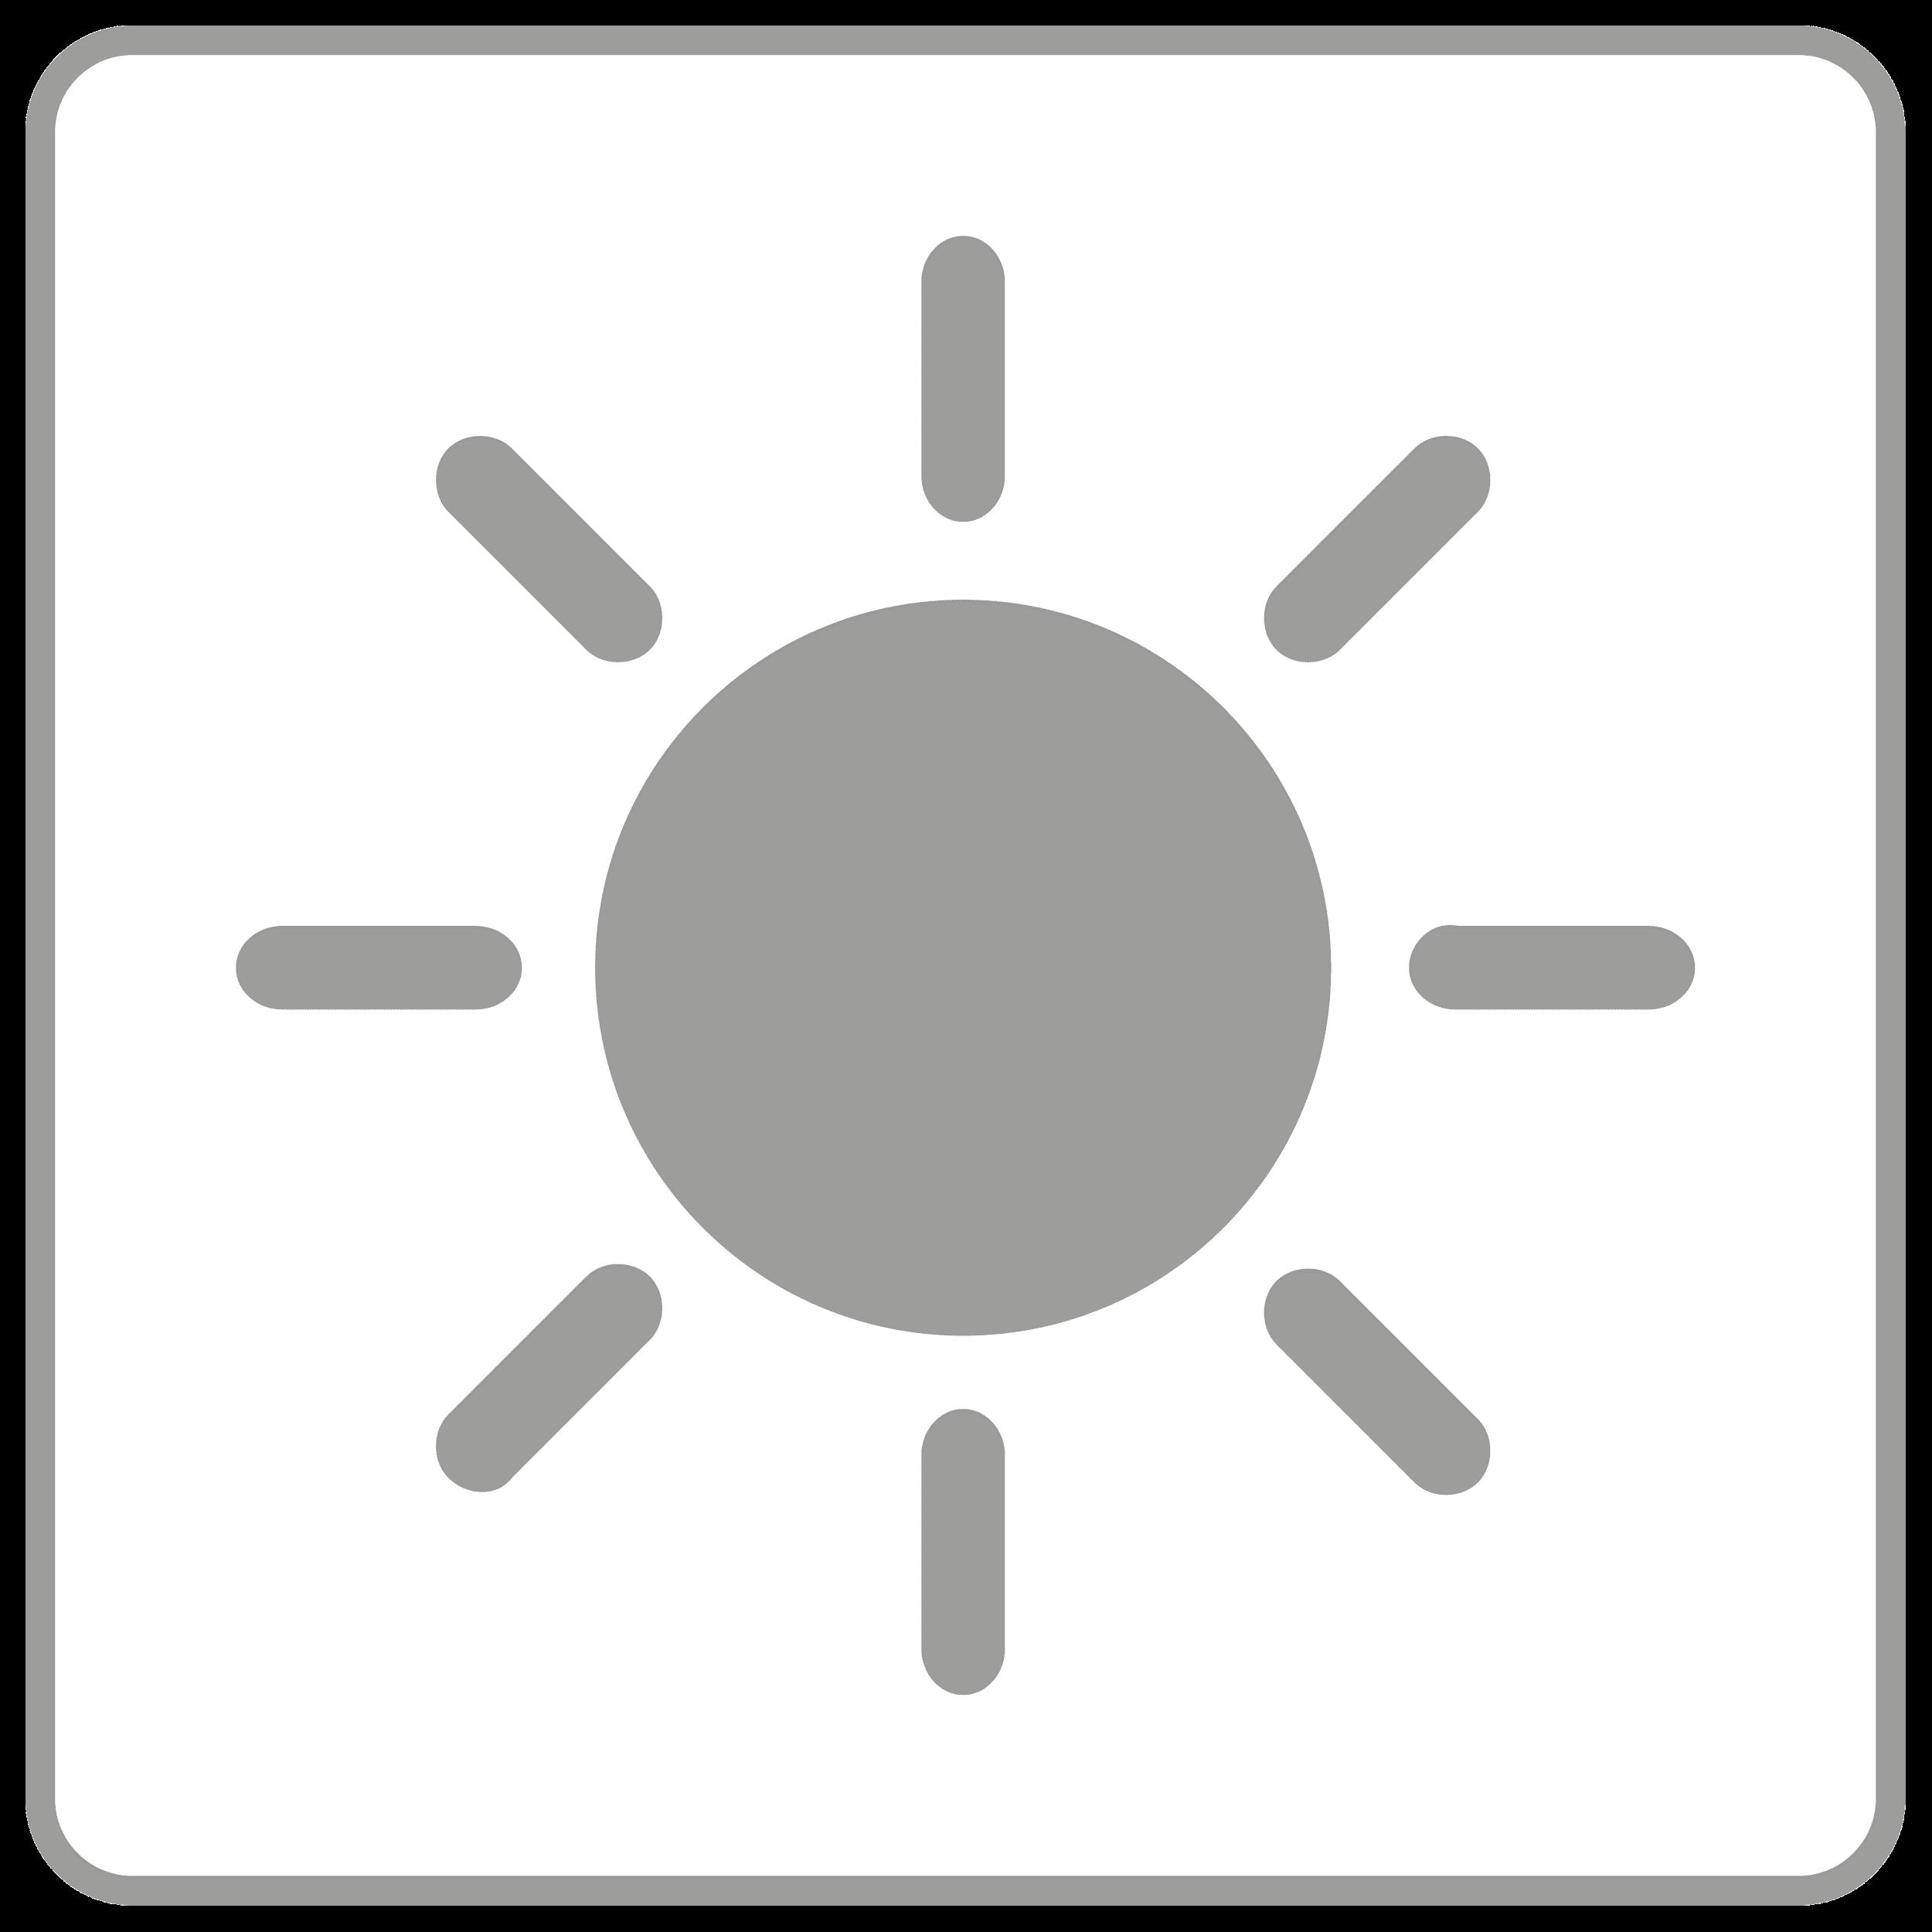 imagen sobre energía solar fotovoltaica